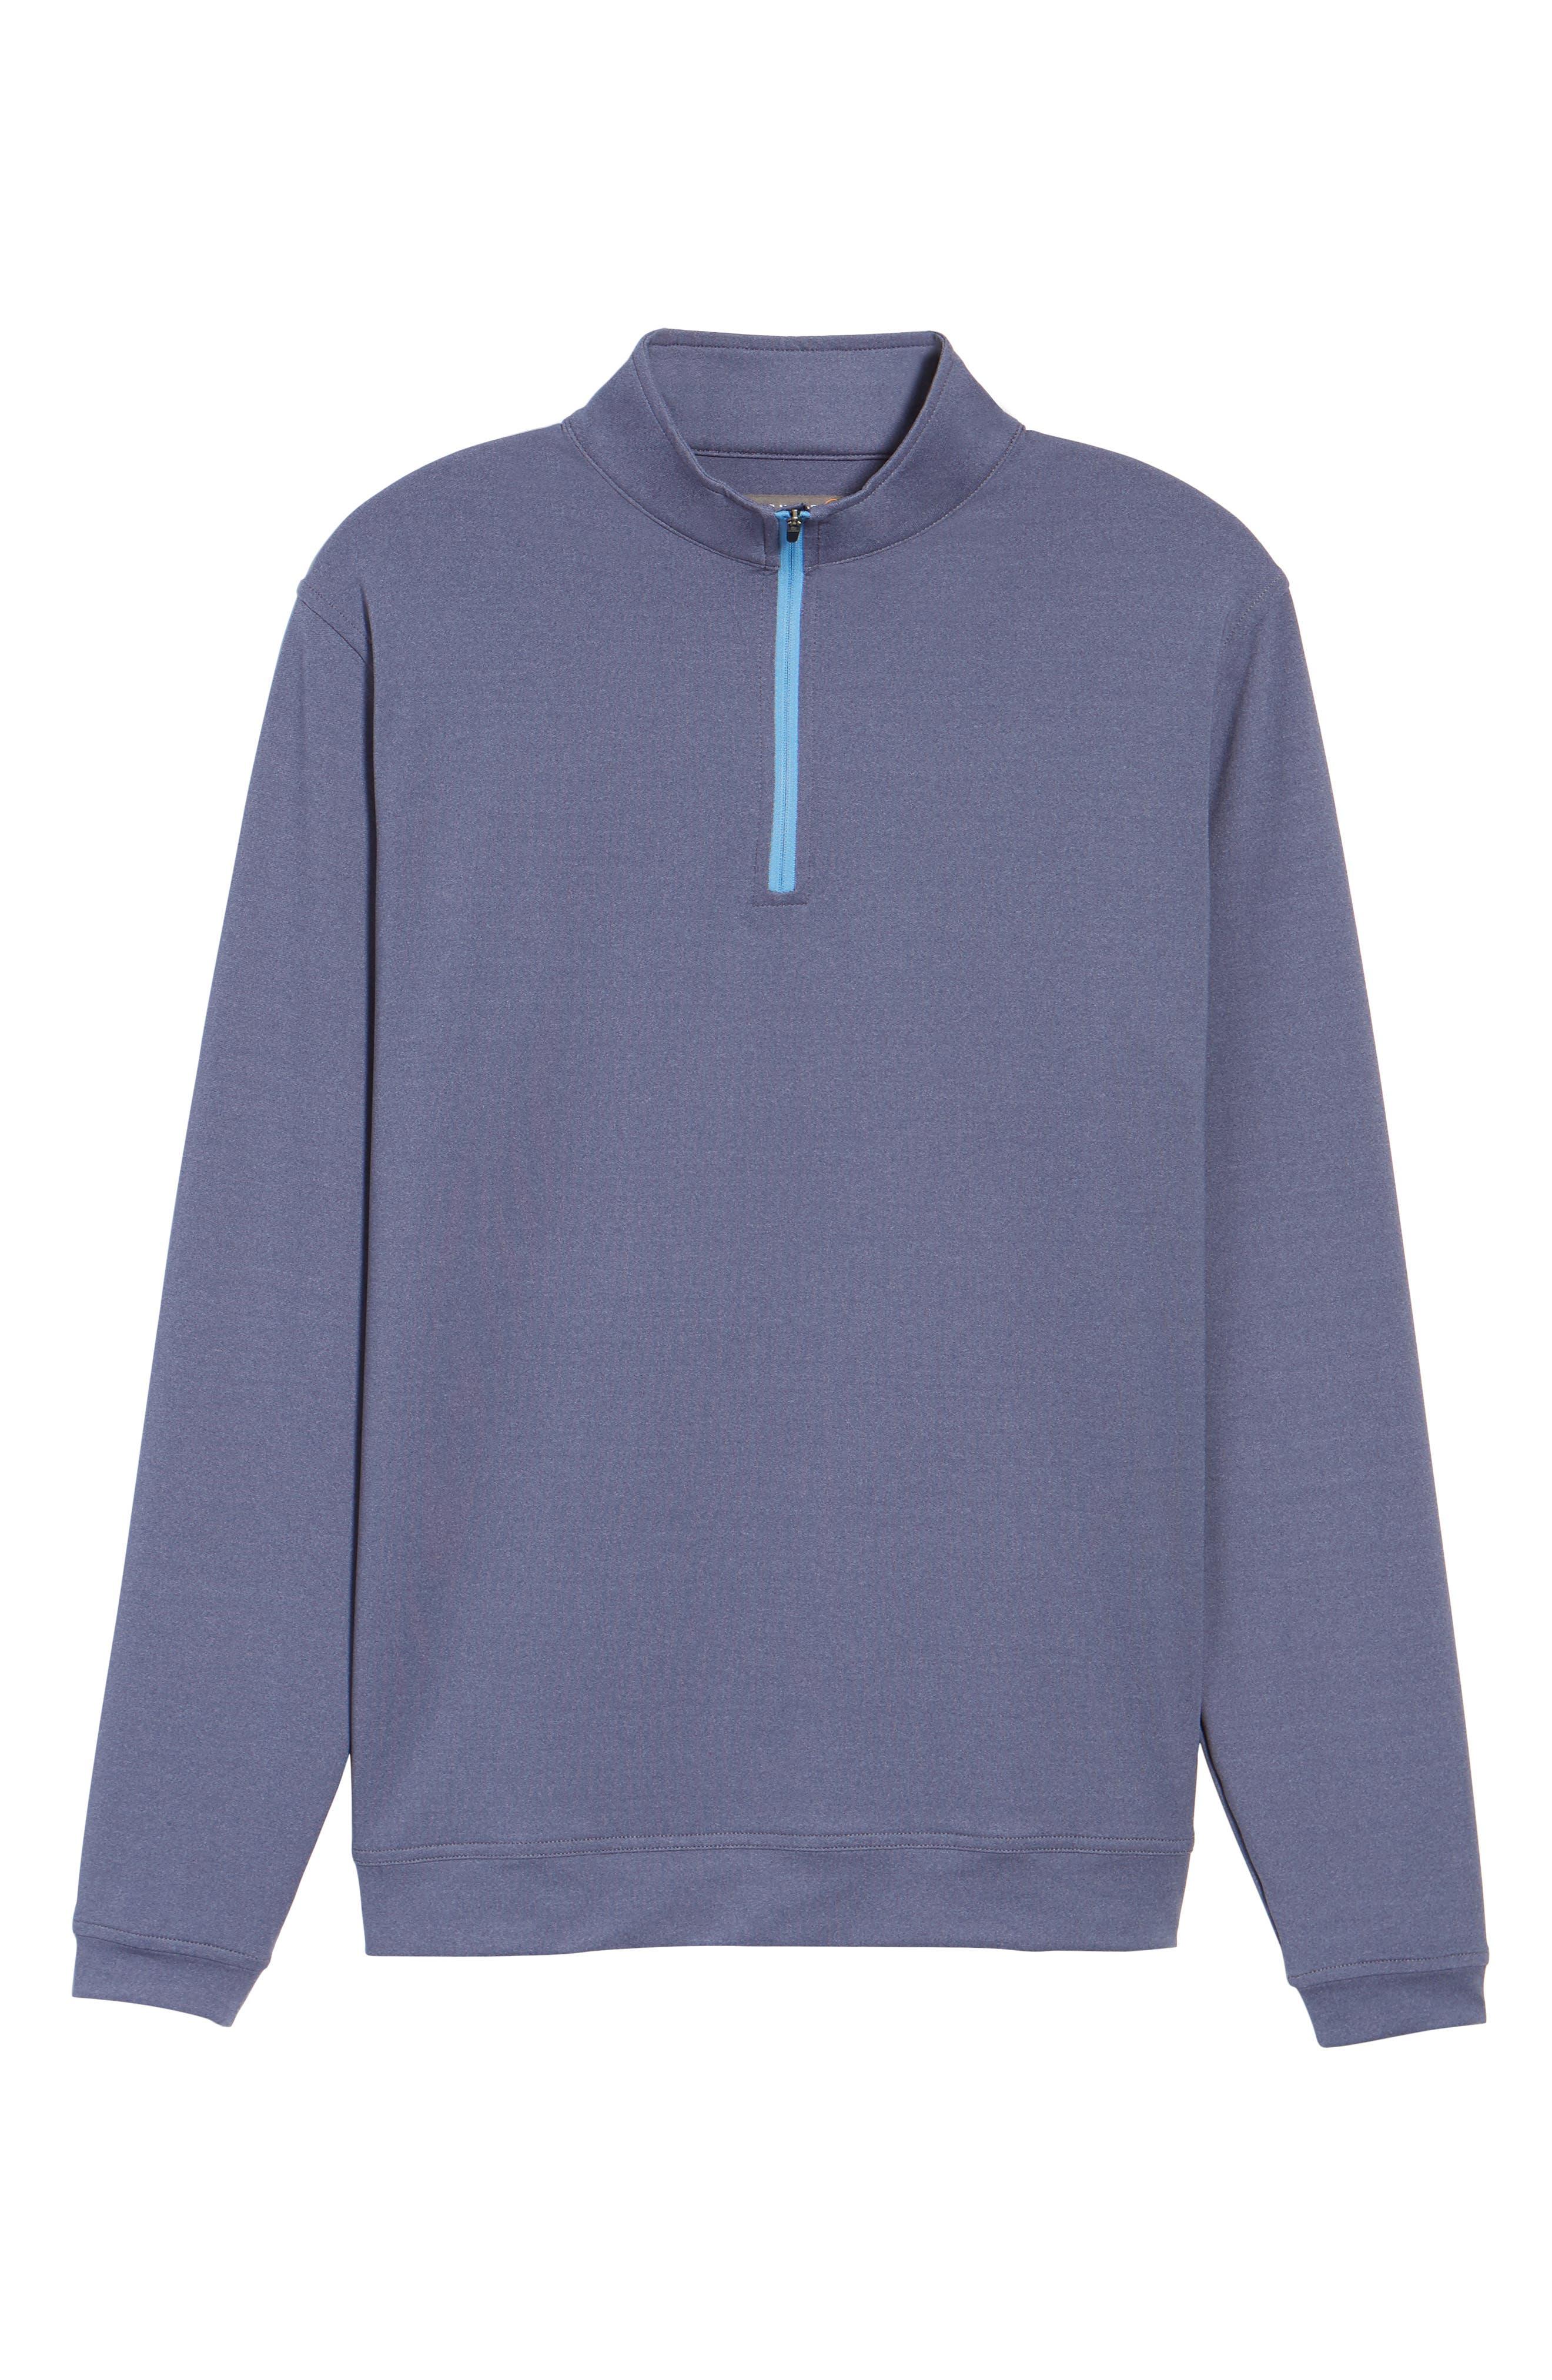 Perth Quarter Zip Stretch Pullover,                             Alternate thumbnail 6, color,                             Blackberry